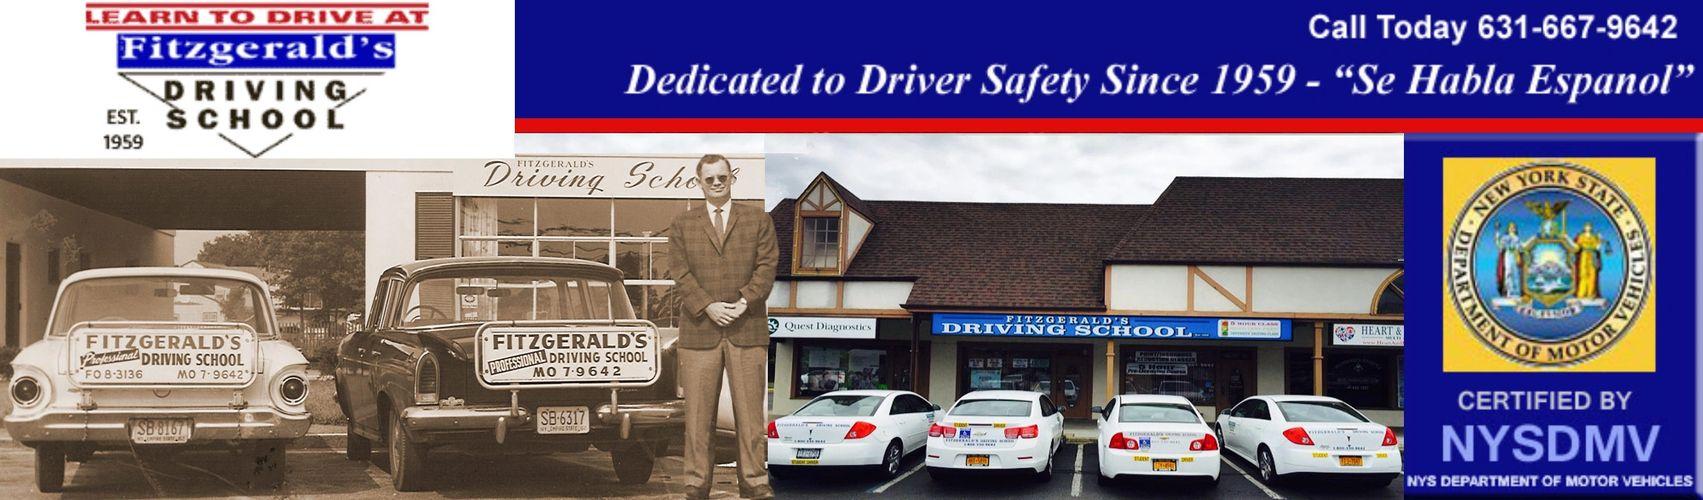 Fitzgeralds Driving School